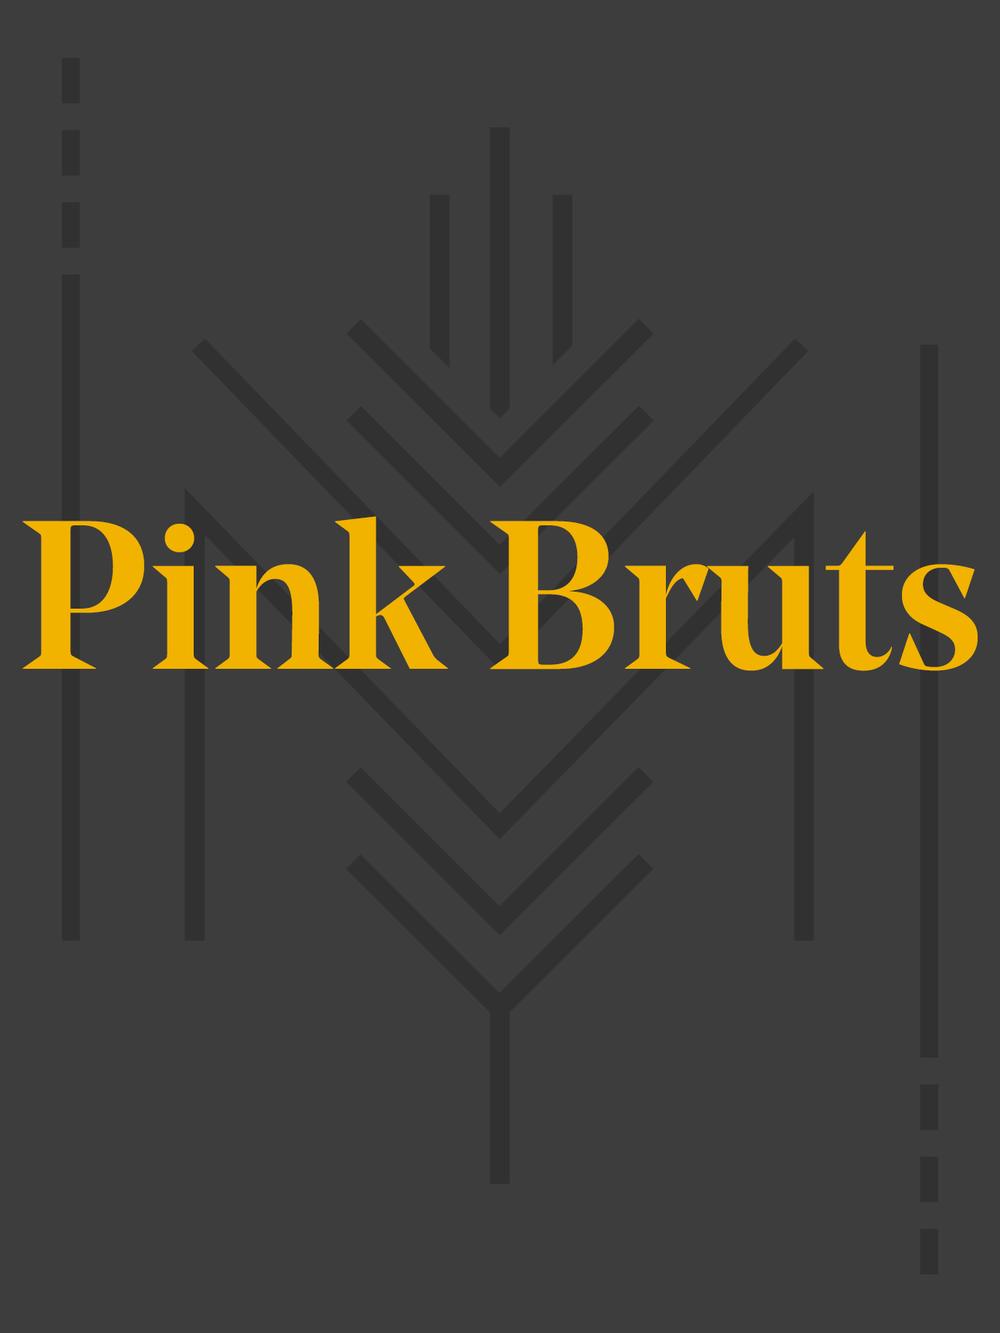 PinkBruts.png